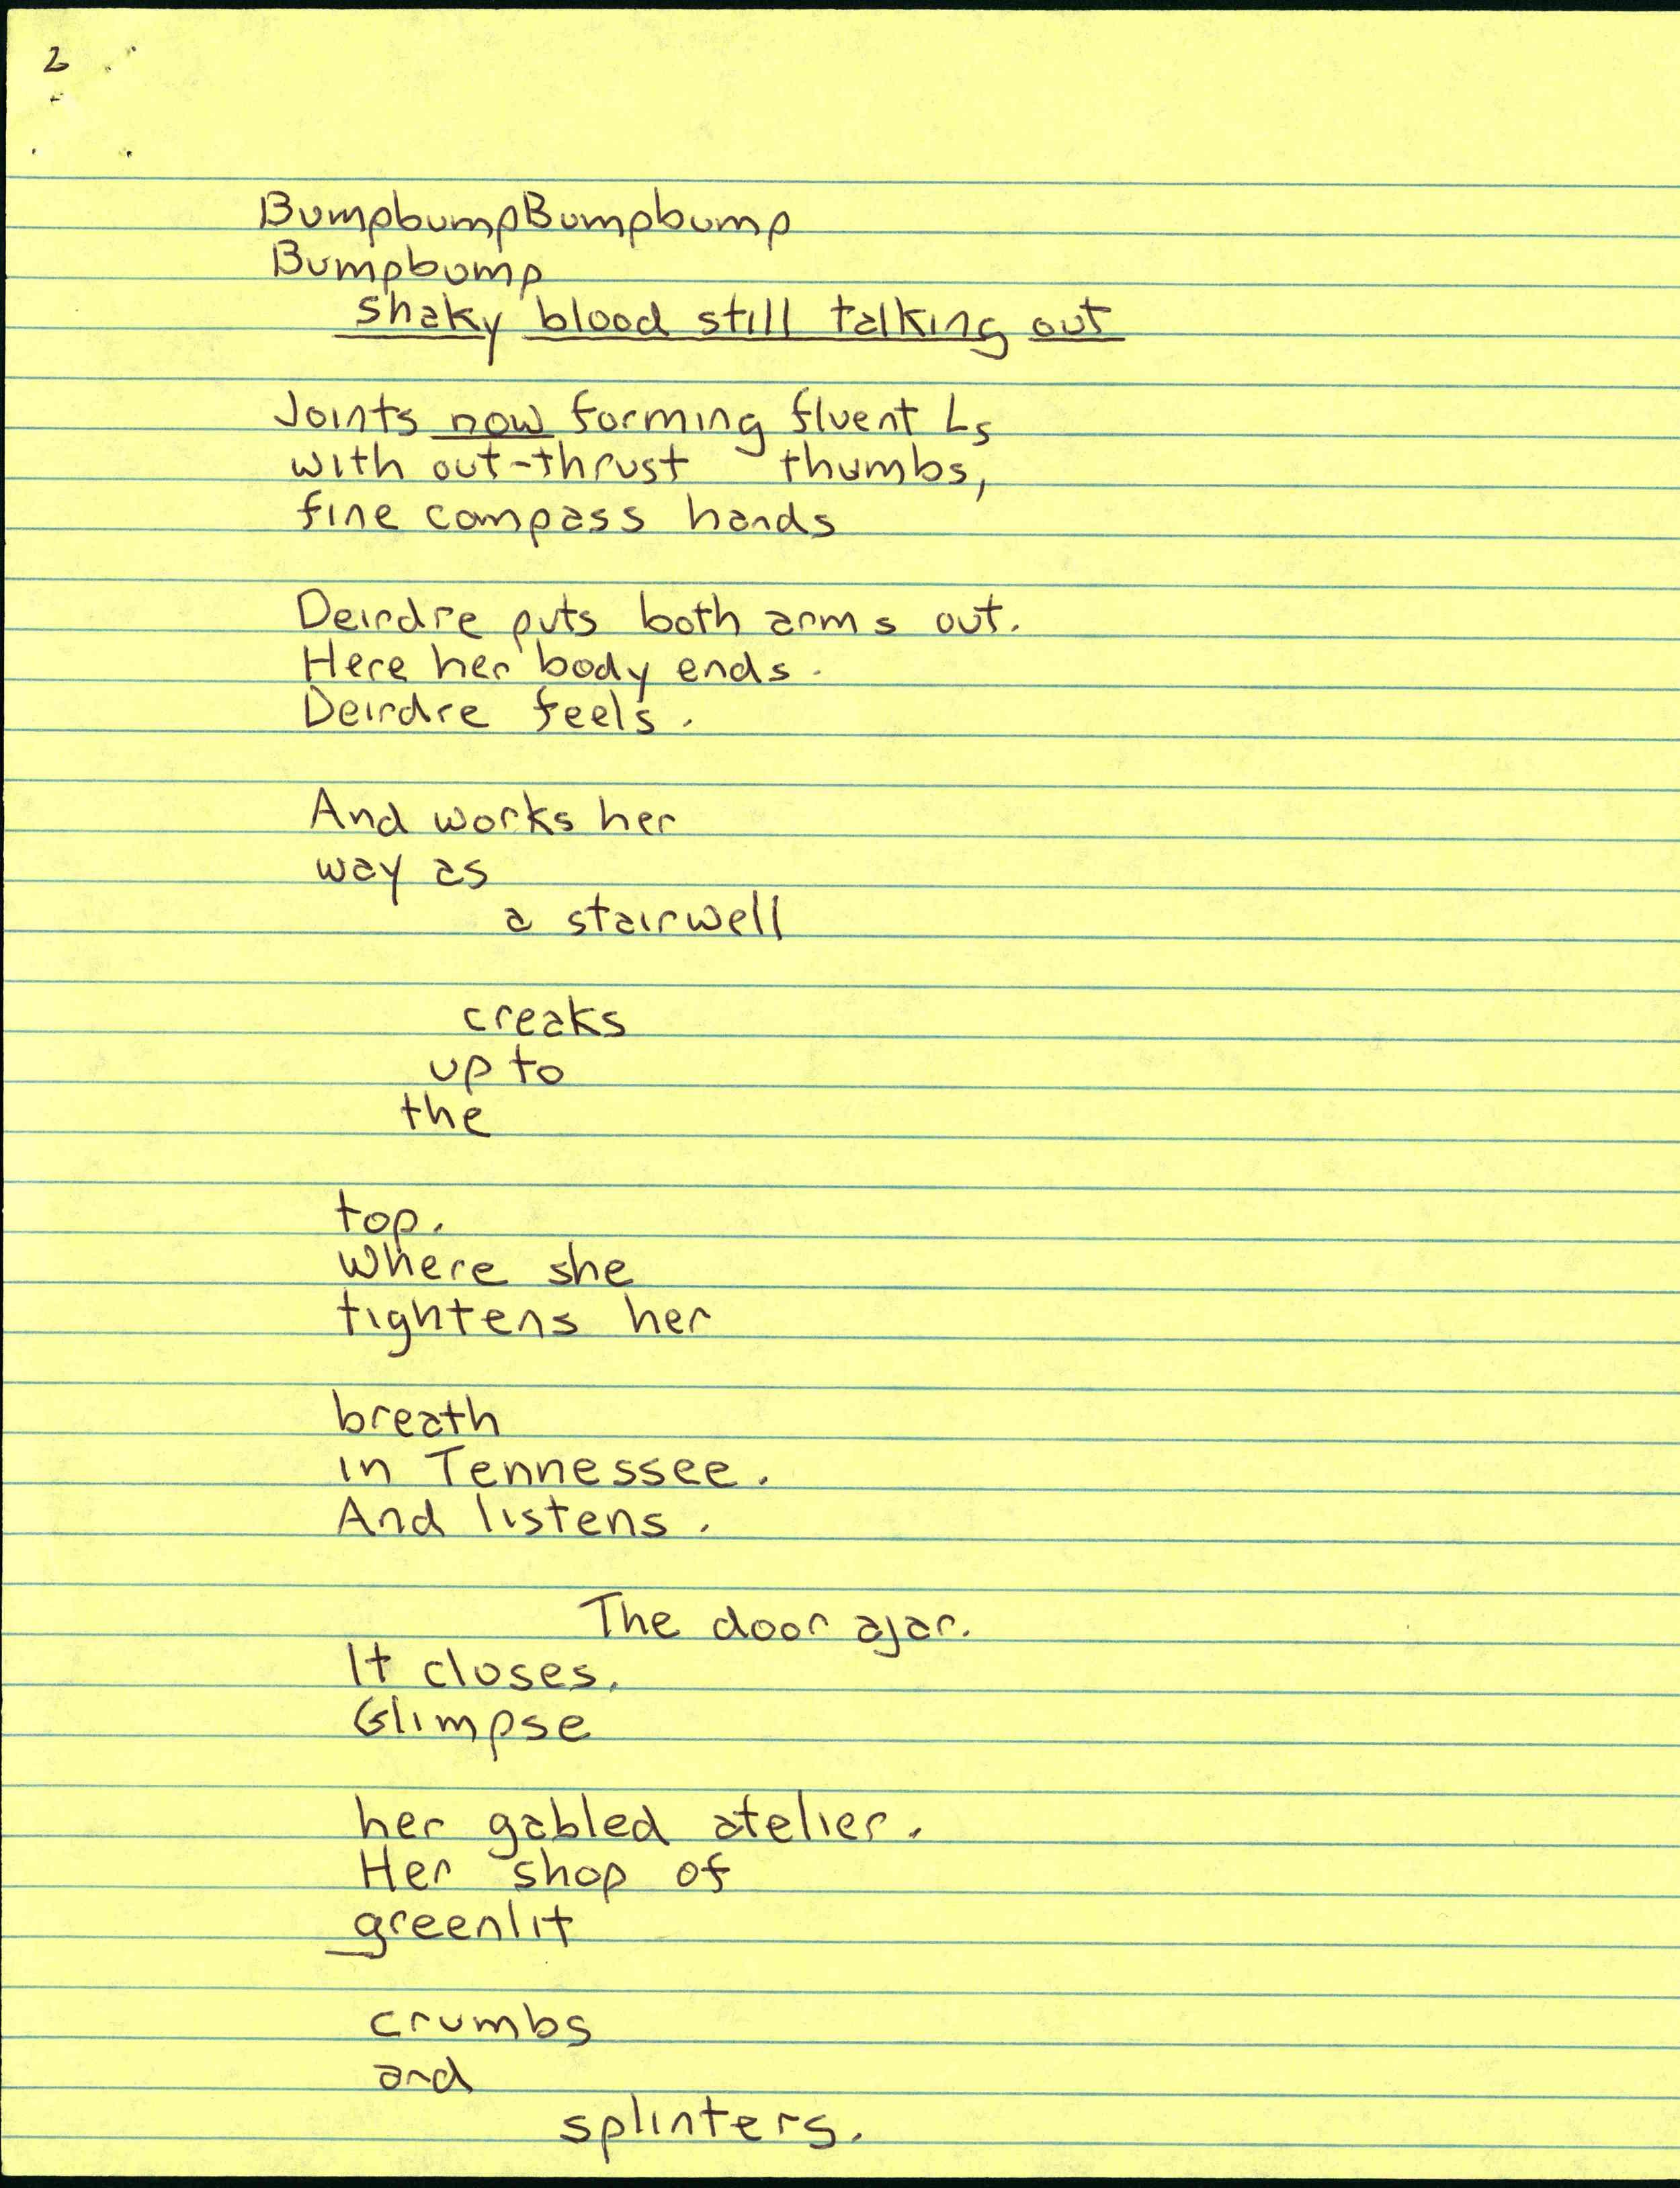 Jim G Wee - Sketching Deirdre Yell Yell (2).jpg